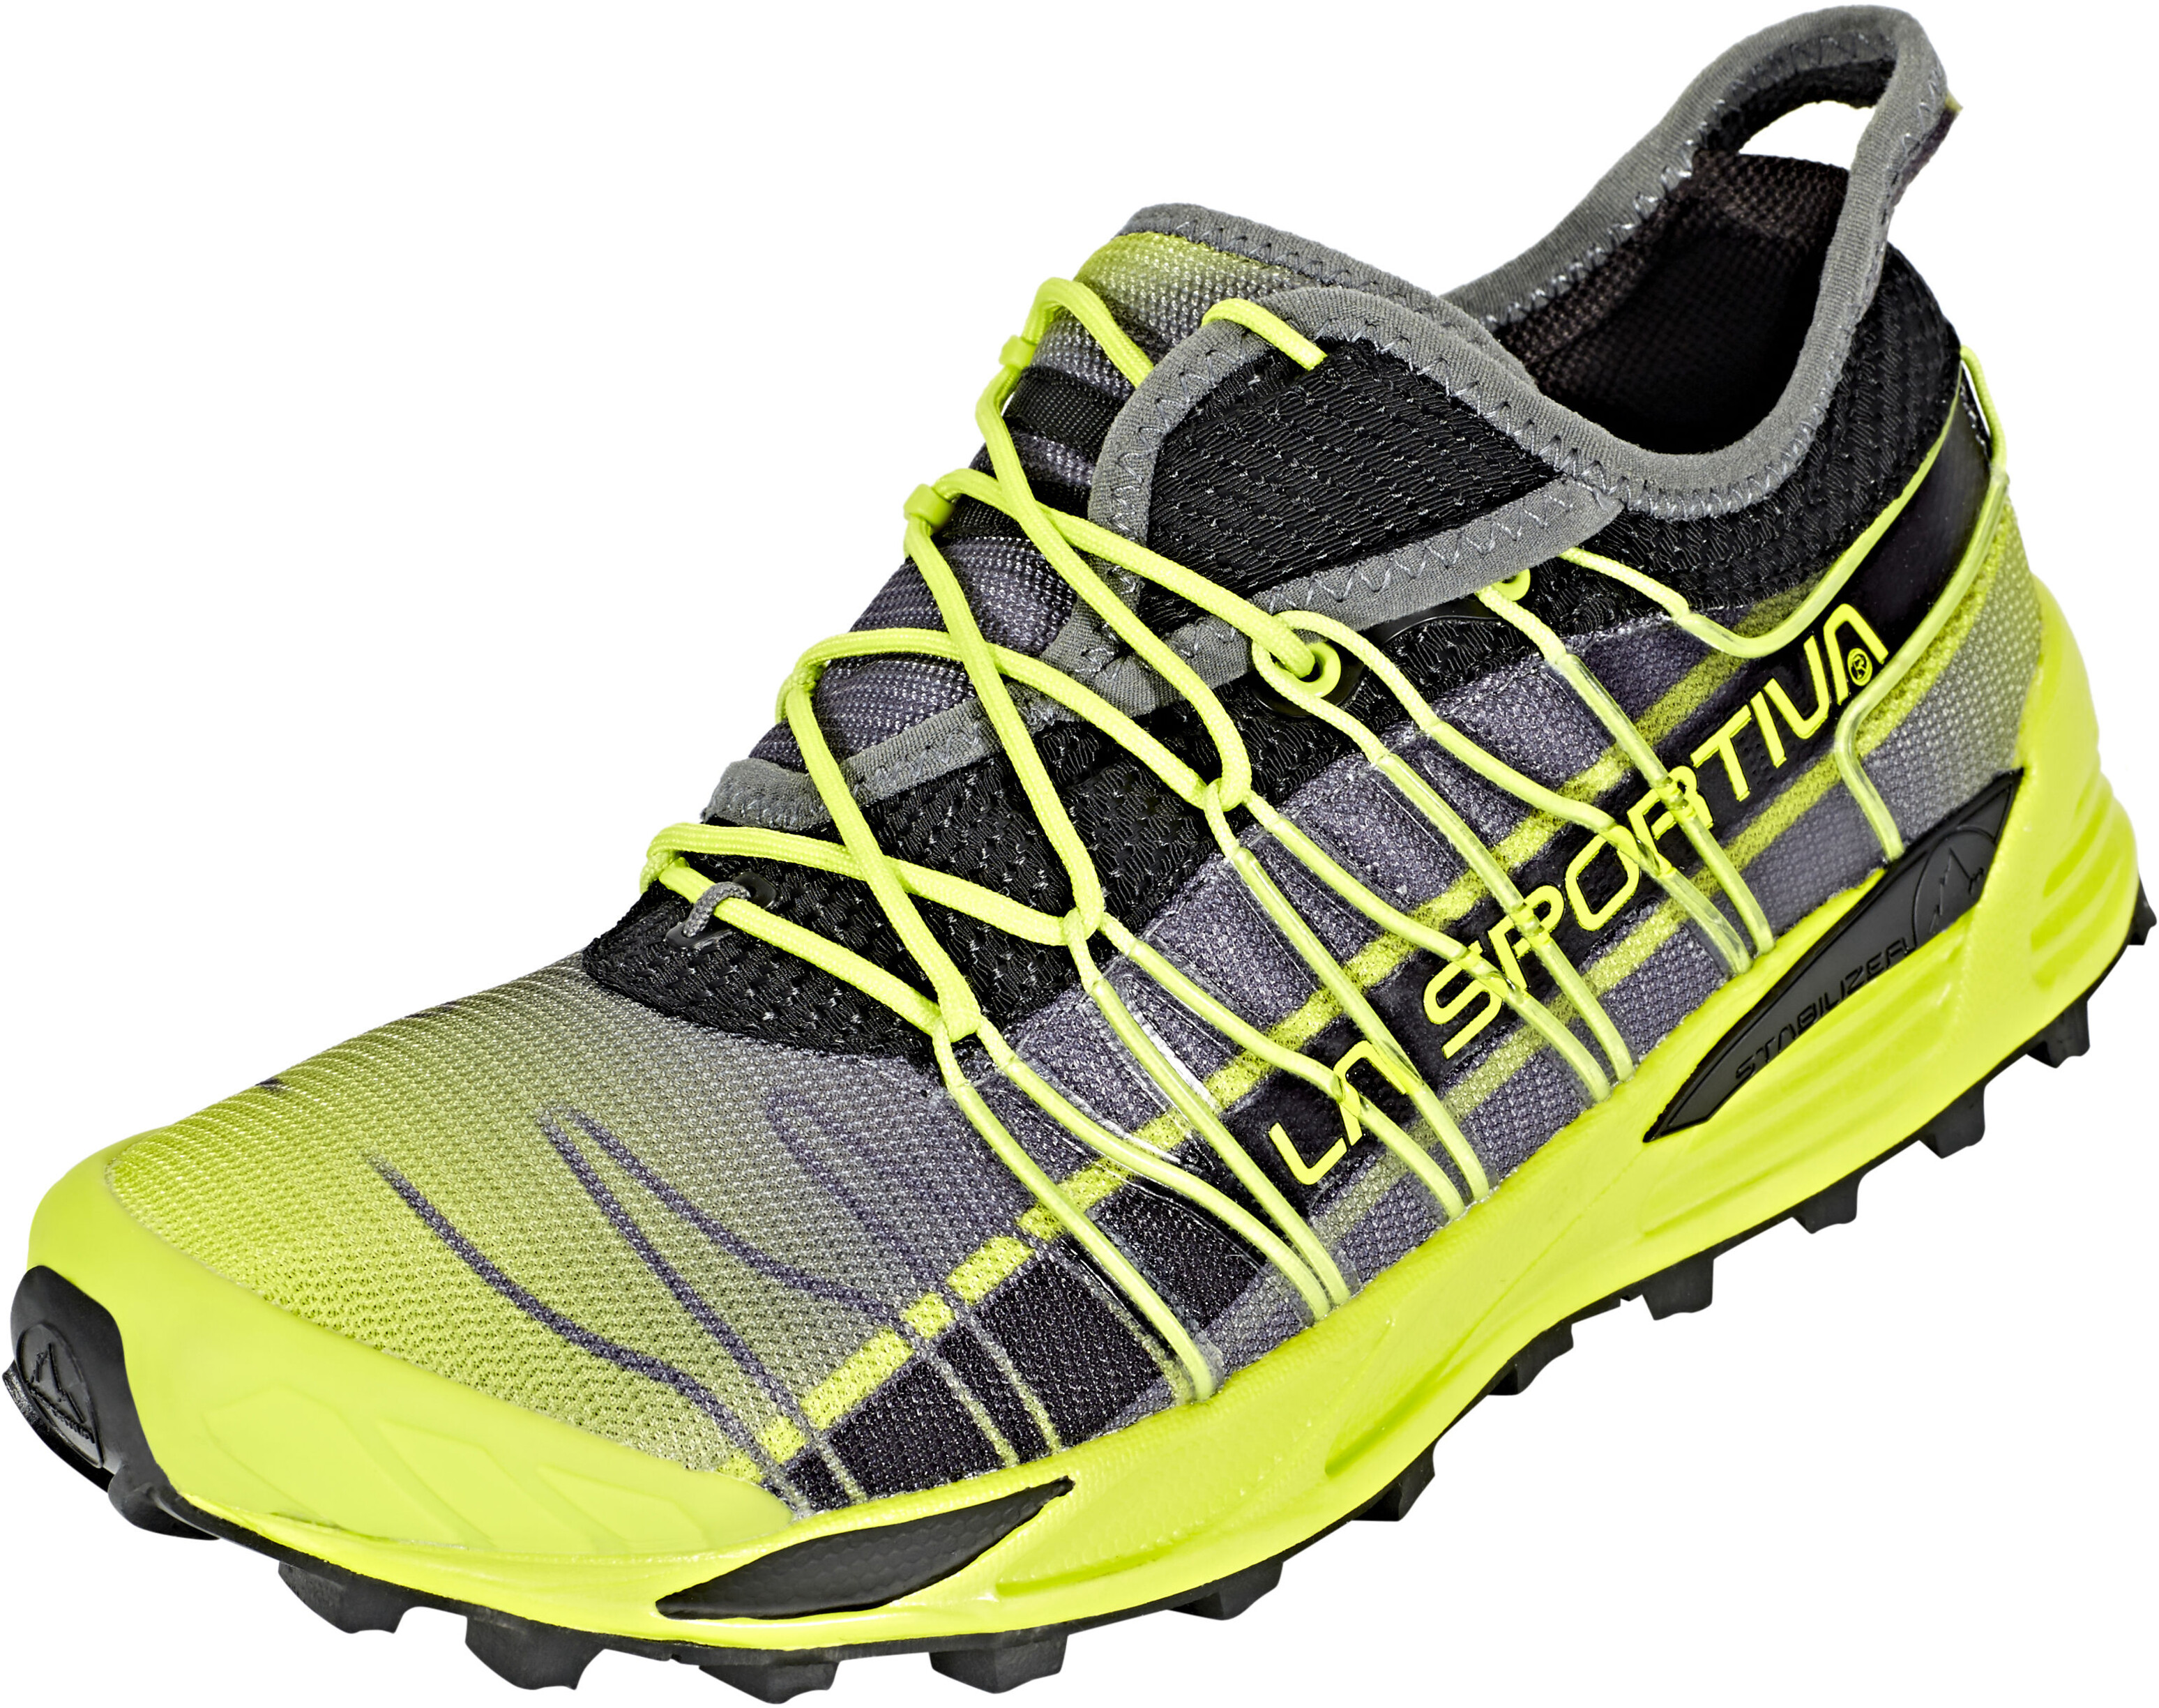 ea962cc6003 La Sportiva Mutant Running Shoes Men yellow grey